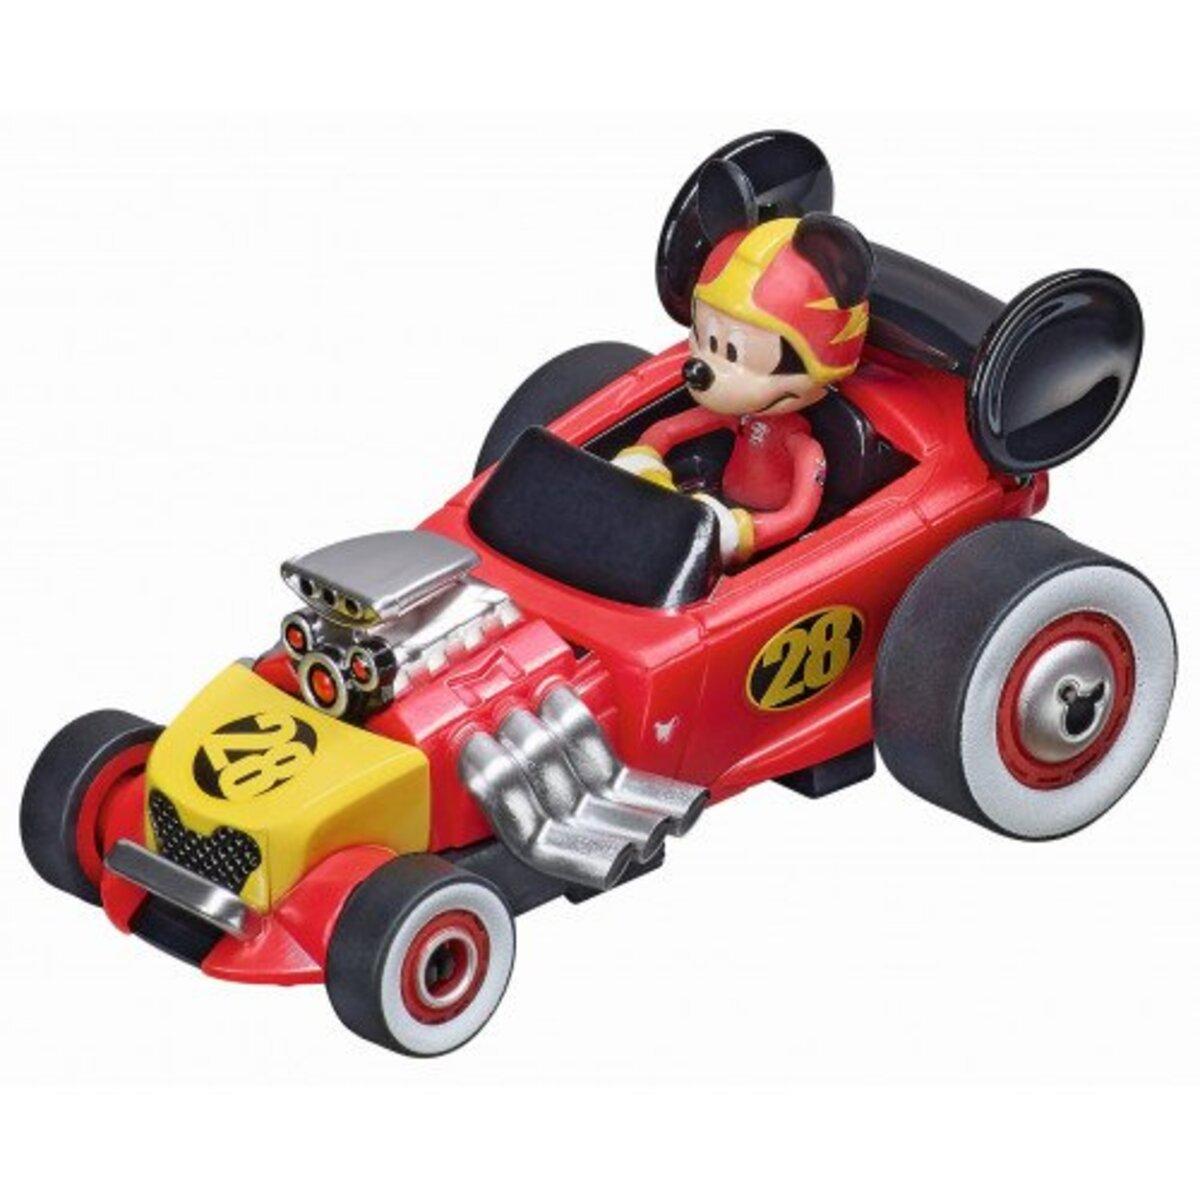 Bild 3 von Carrera FIRST Mickey and Roadster Racers